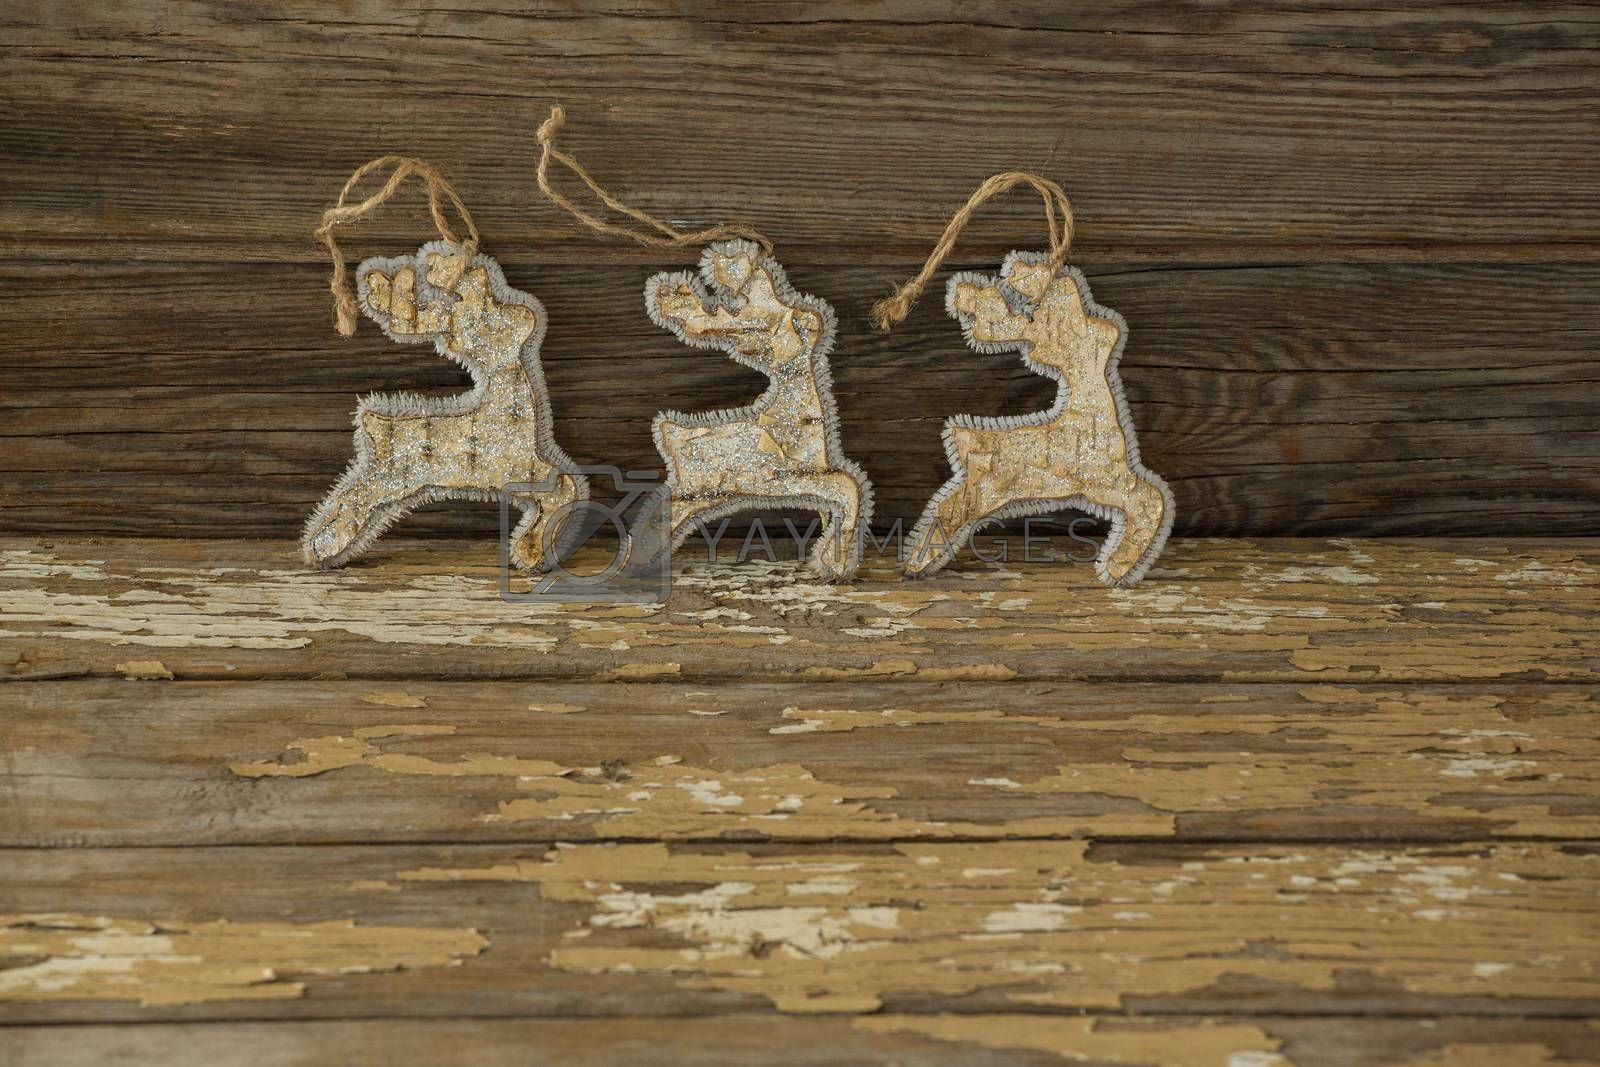 Reindeer decorations against wooden plank by Wavebreakmedia